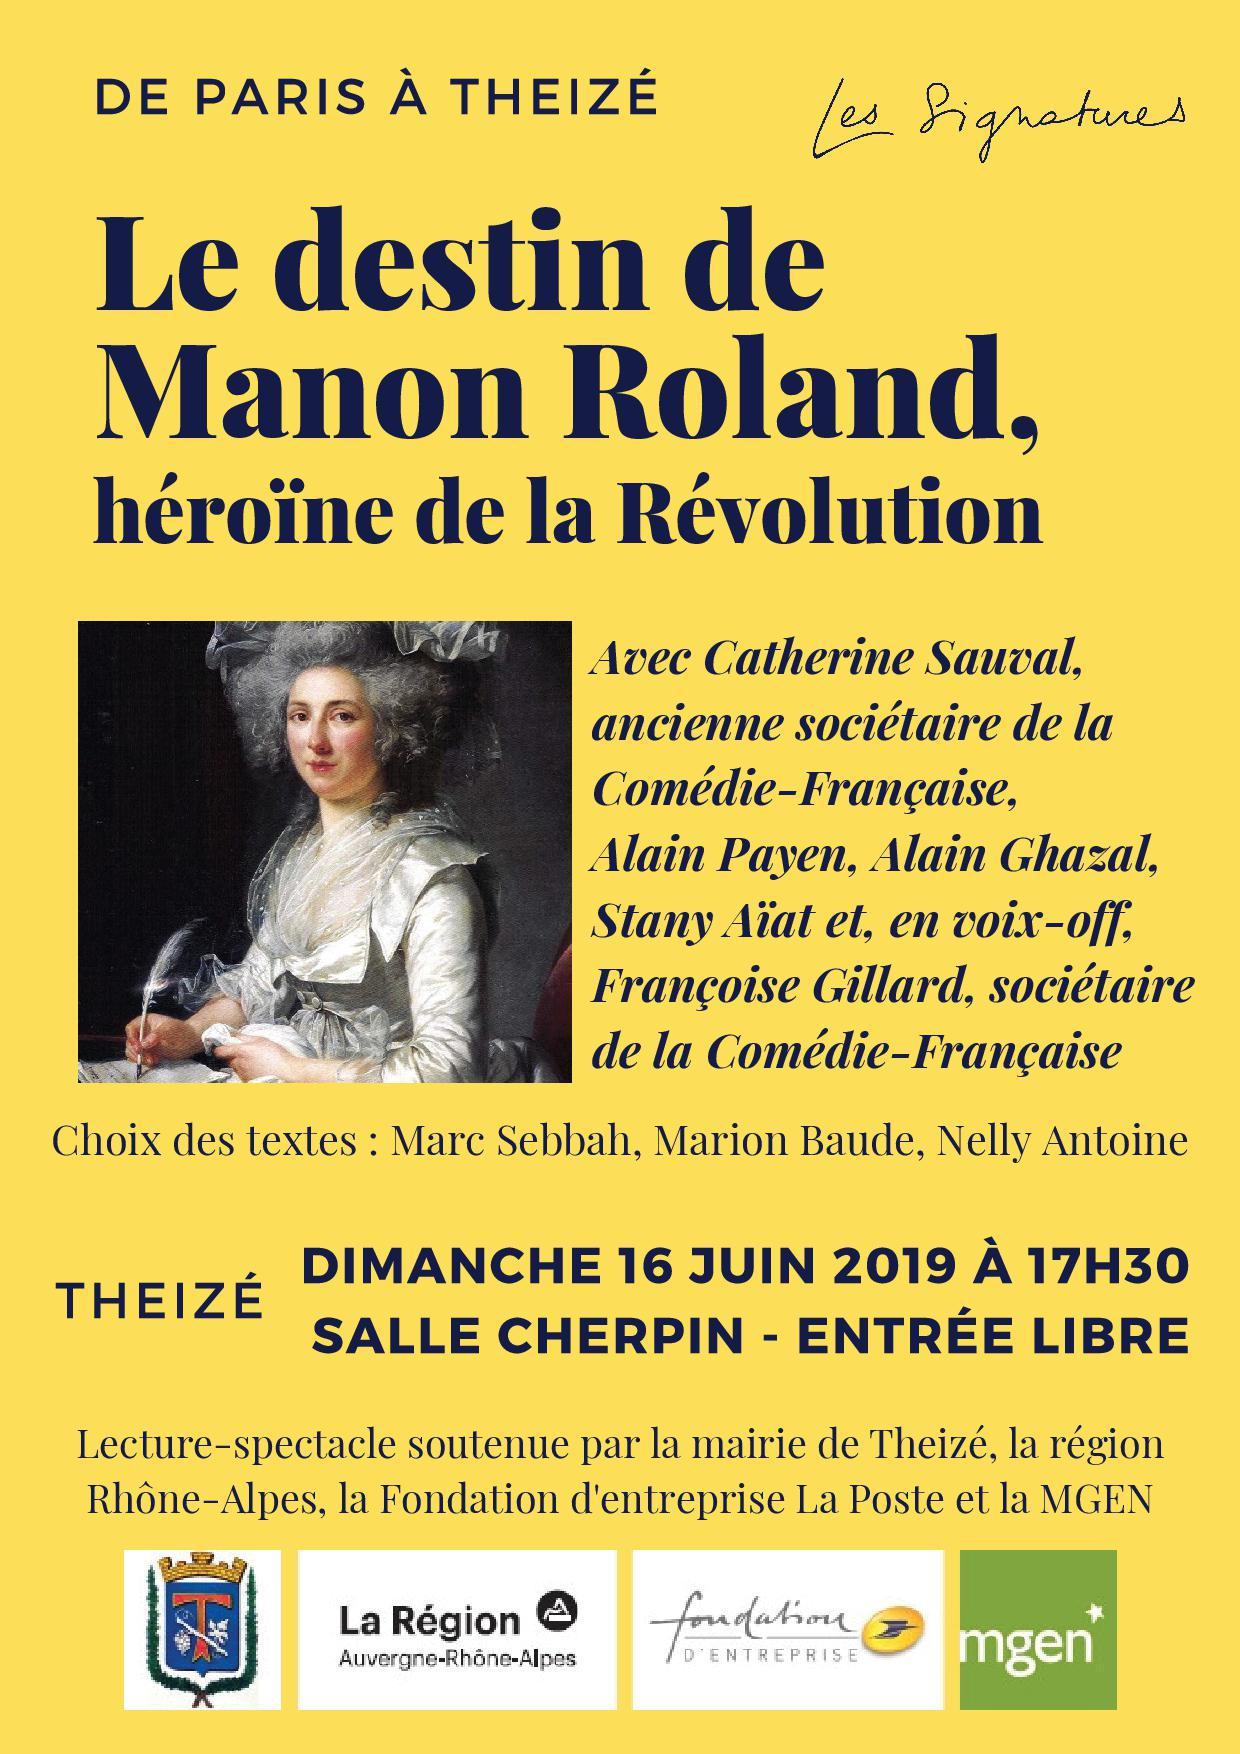 le destin de Manon Roland heroine de la revolution 2